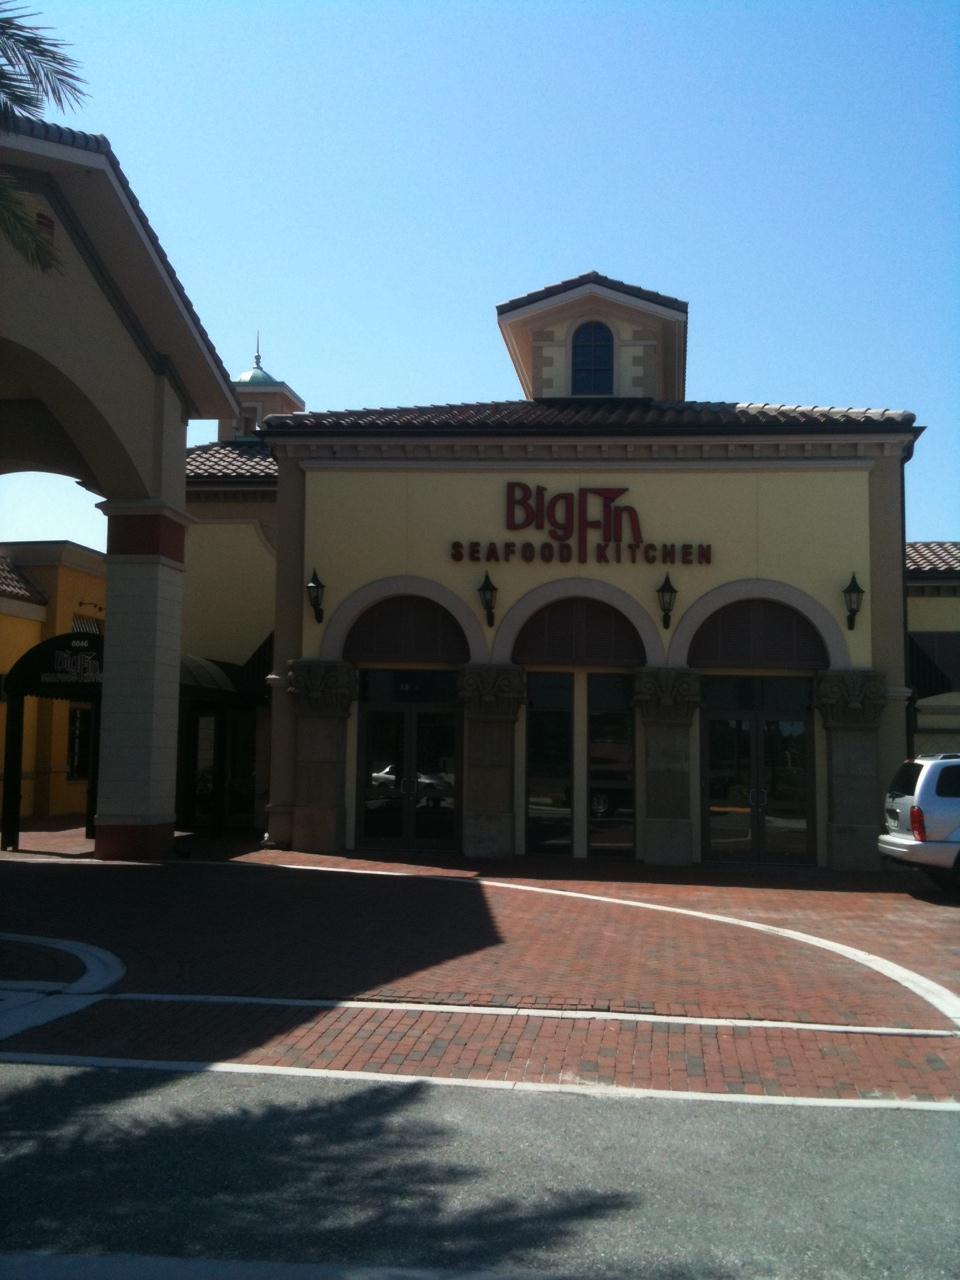 Big Fin Seafood Kitchen Orlando Seafood Restaurant